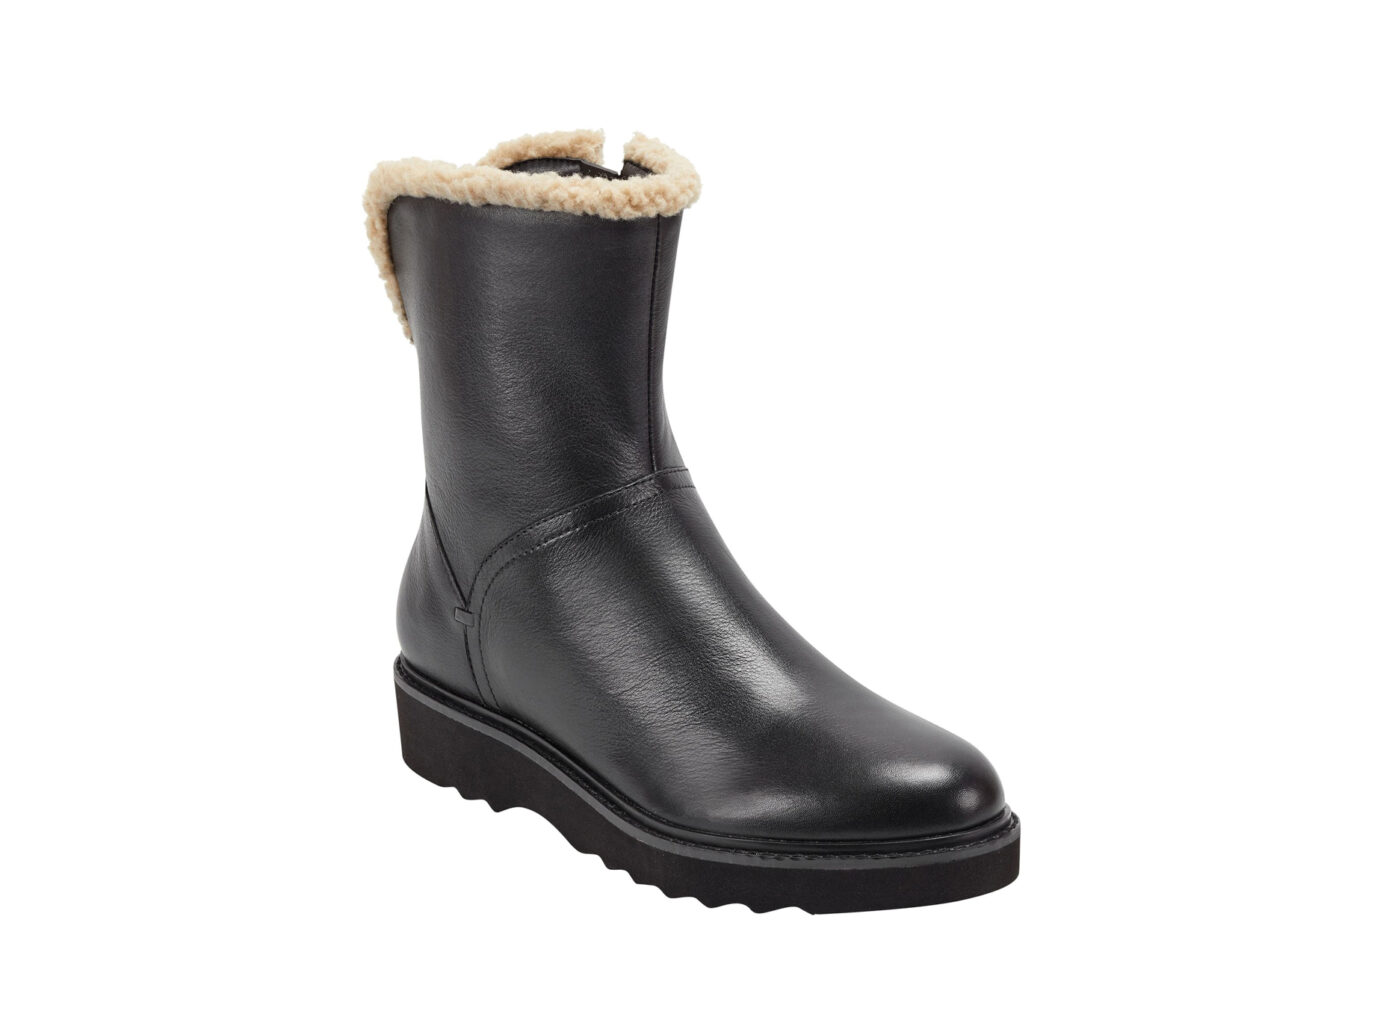 Evolve Honor Waterproof Boot